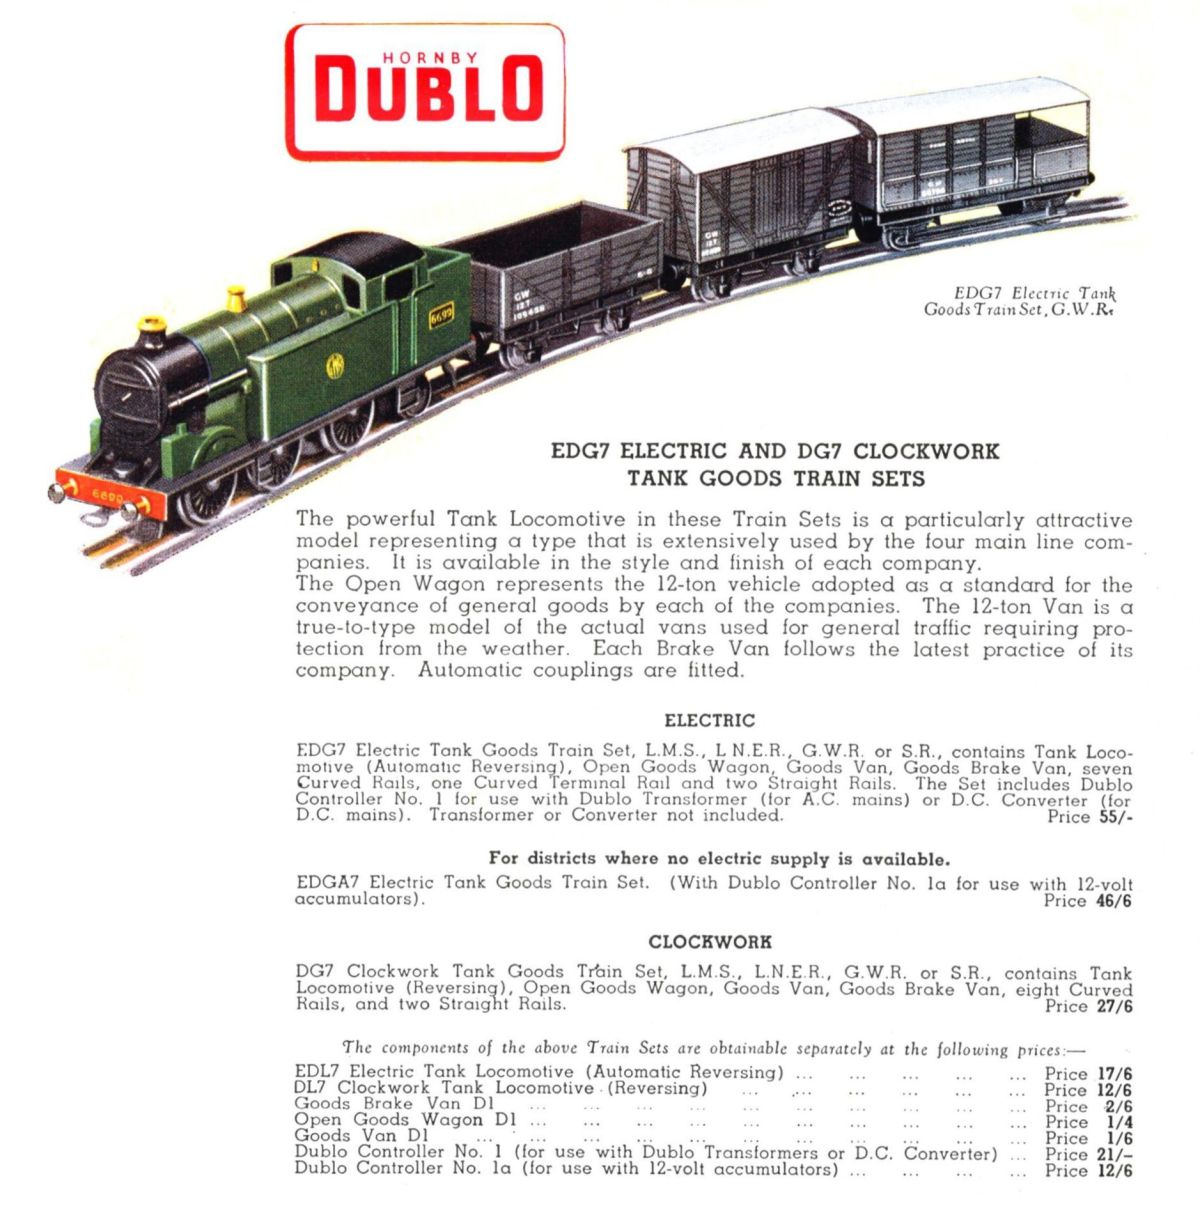 Western Bedroom Tank Toy Box Or: Goods Train Set, GWR, Tank Loco 6699 (Hornby Dublo EDG7